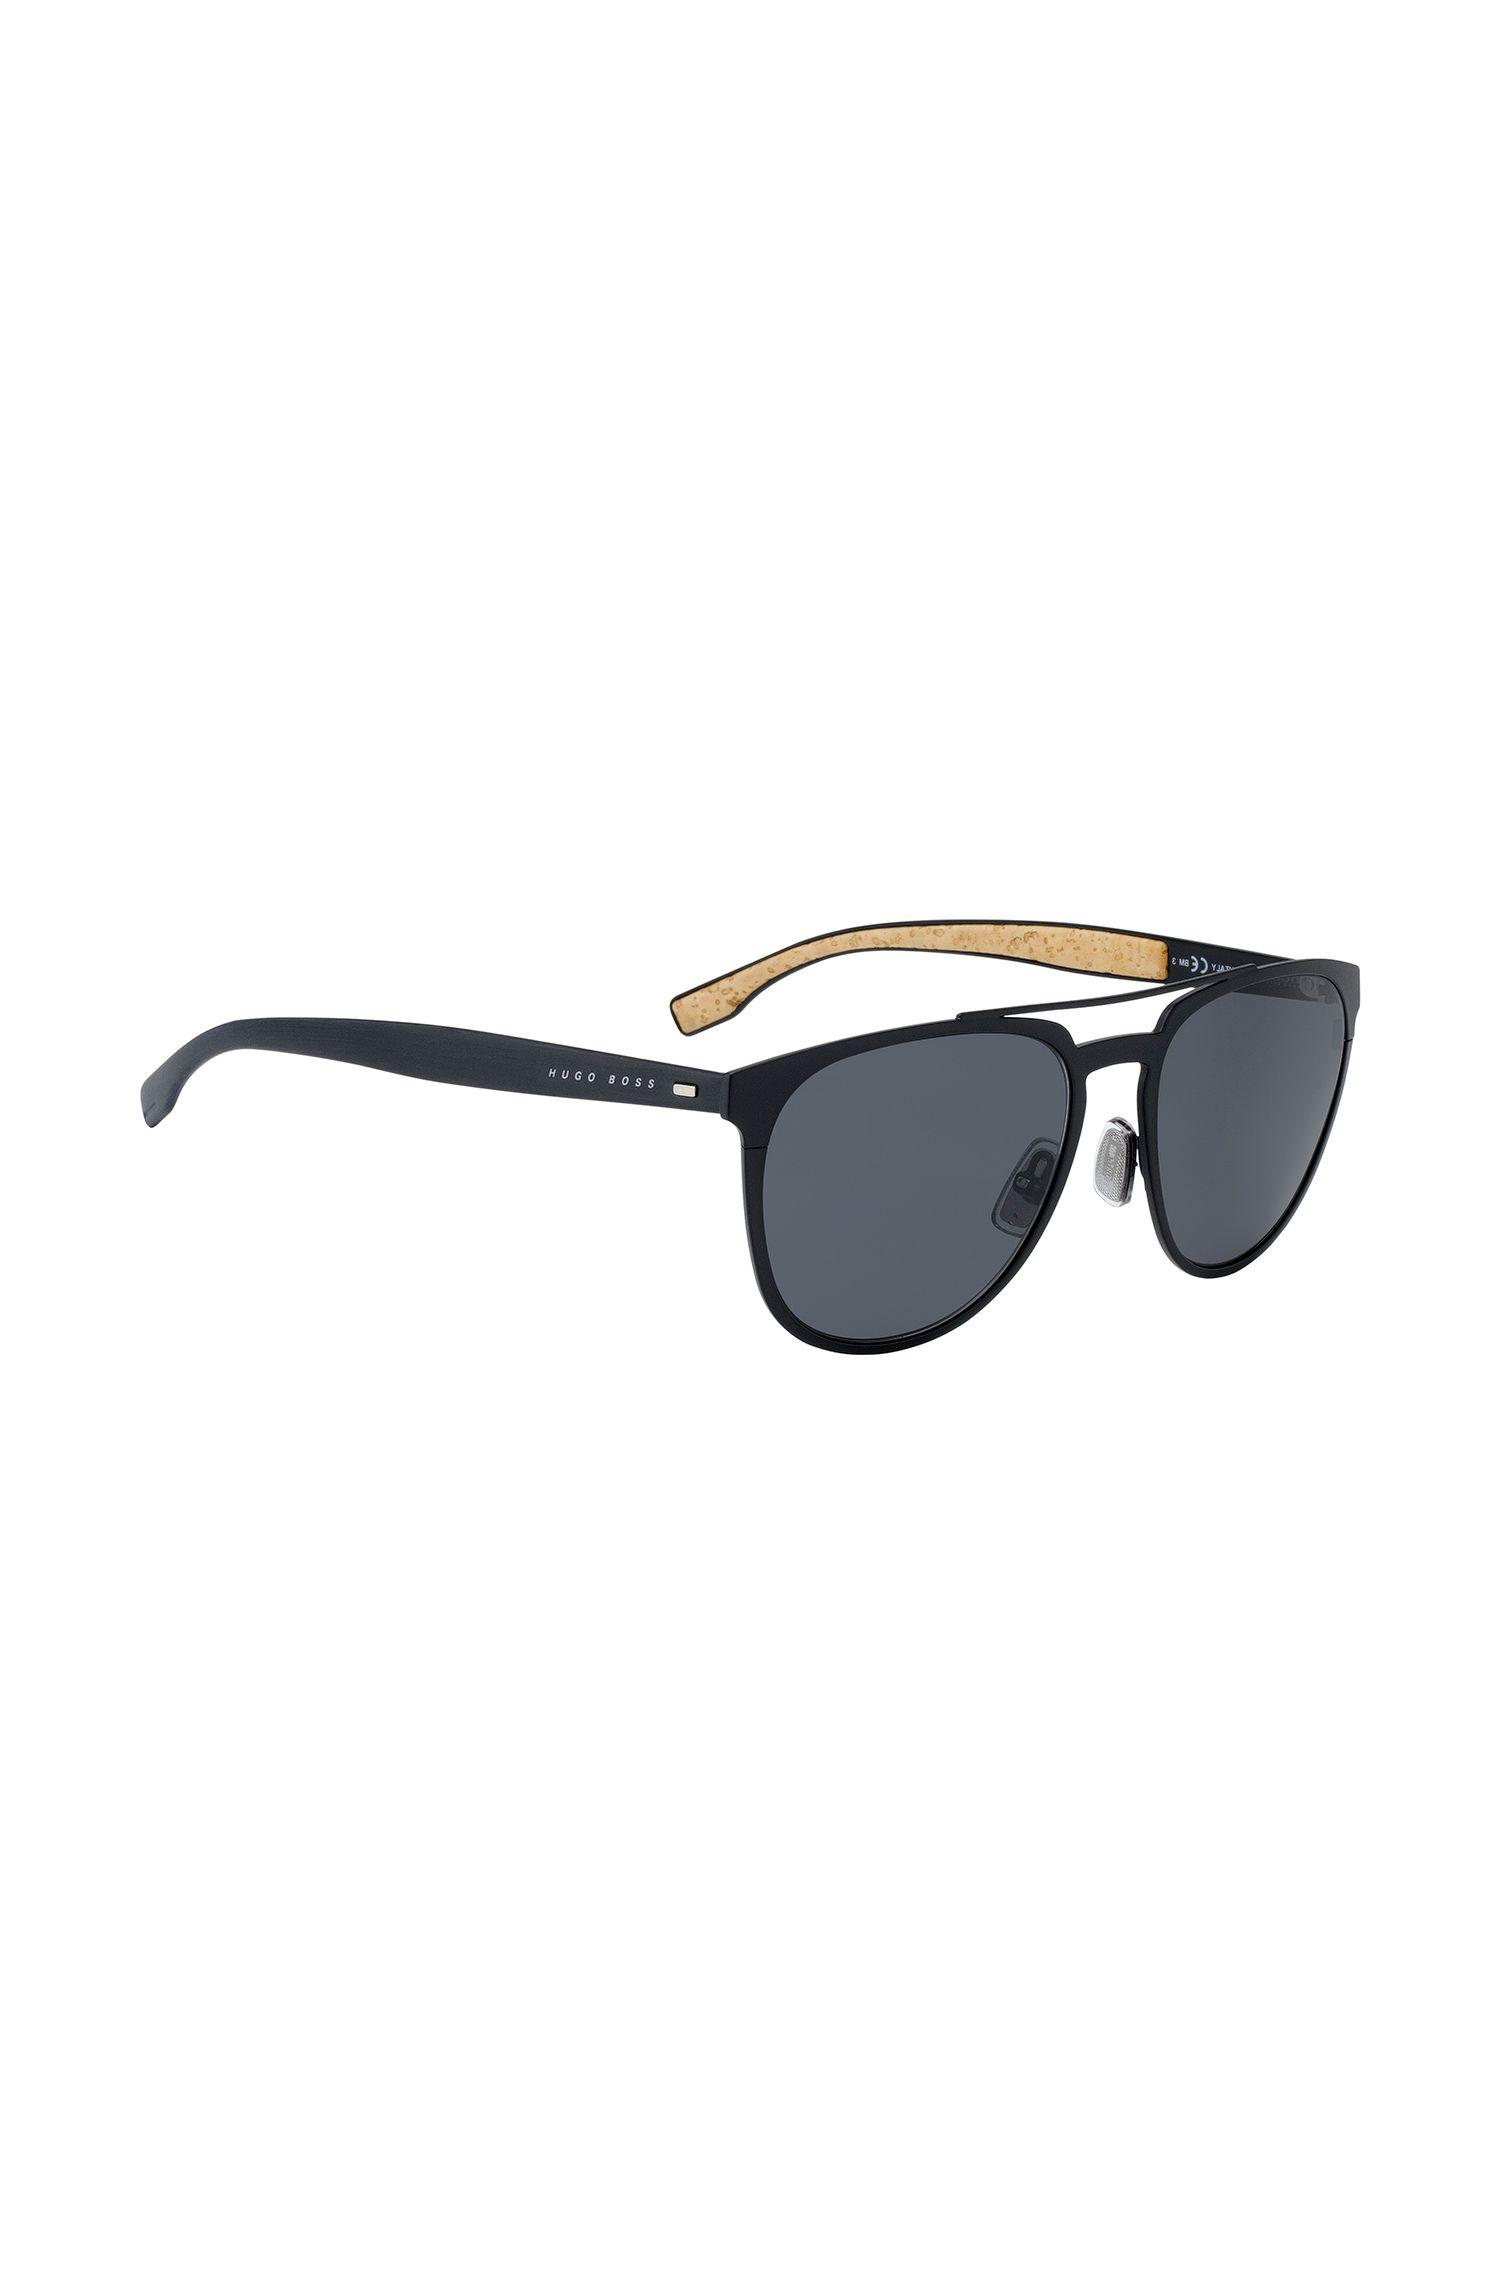 Dark Grey Metal Round Sunglasses | BOSS 0882S, Assorted-Pre-Pack